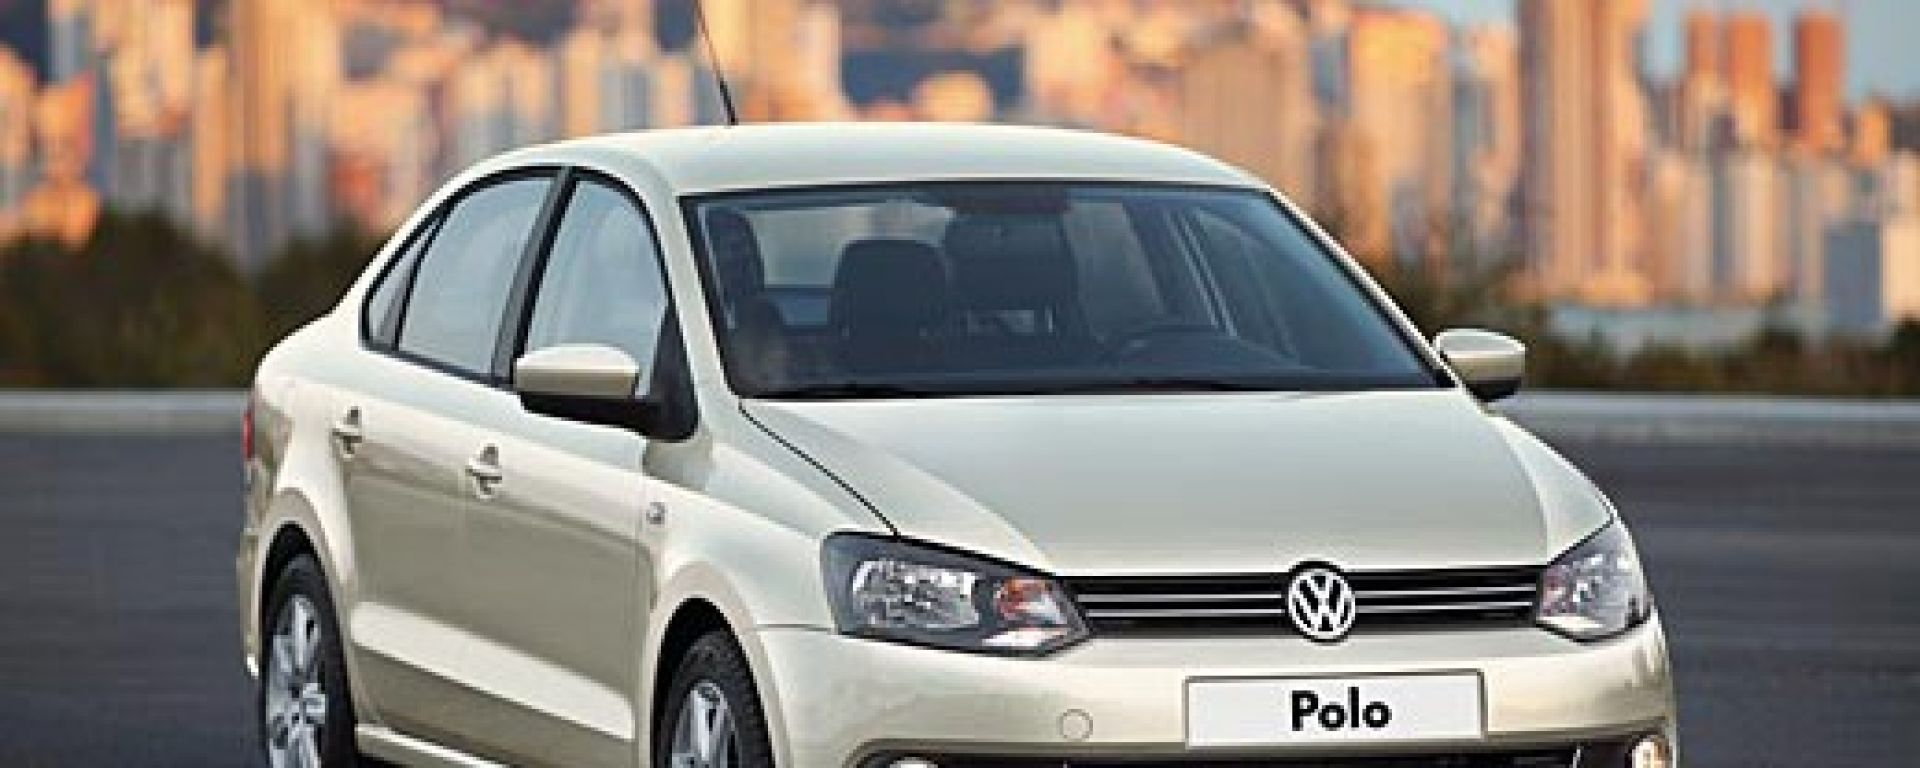 Volkswagen Polo Saloon